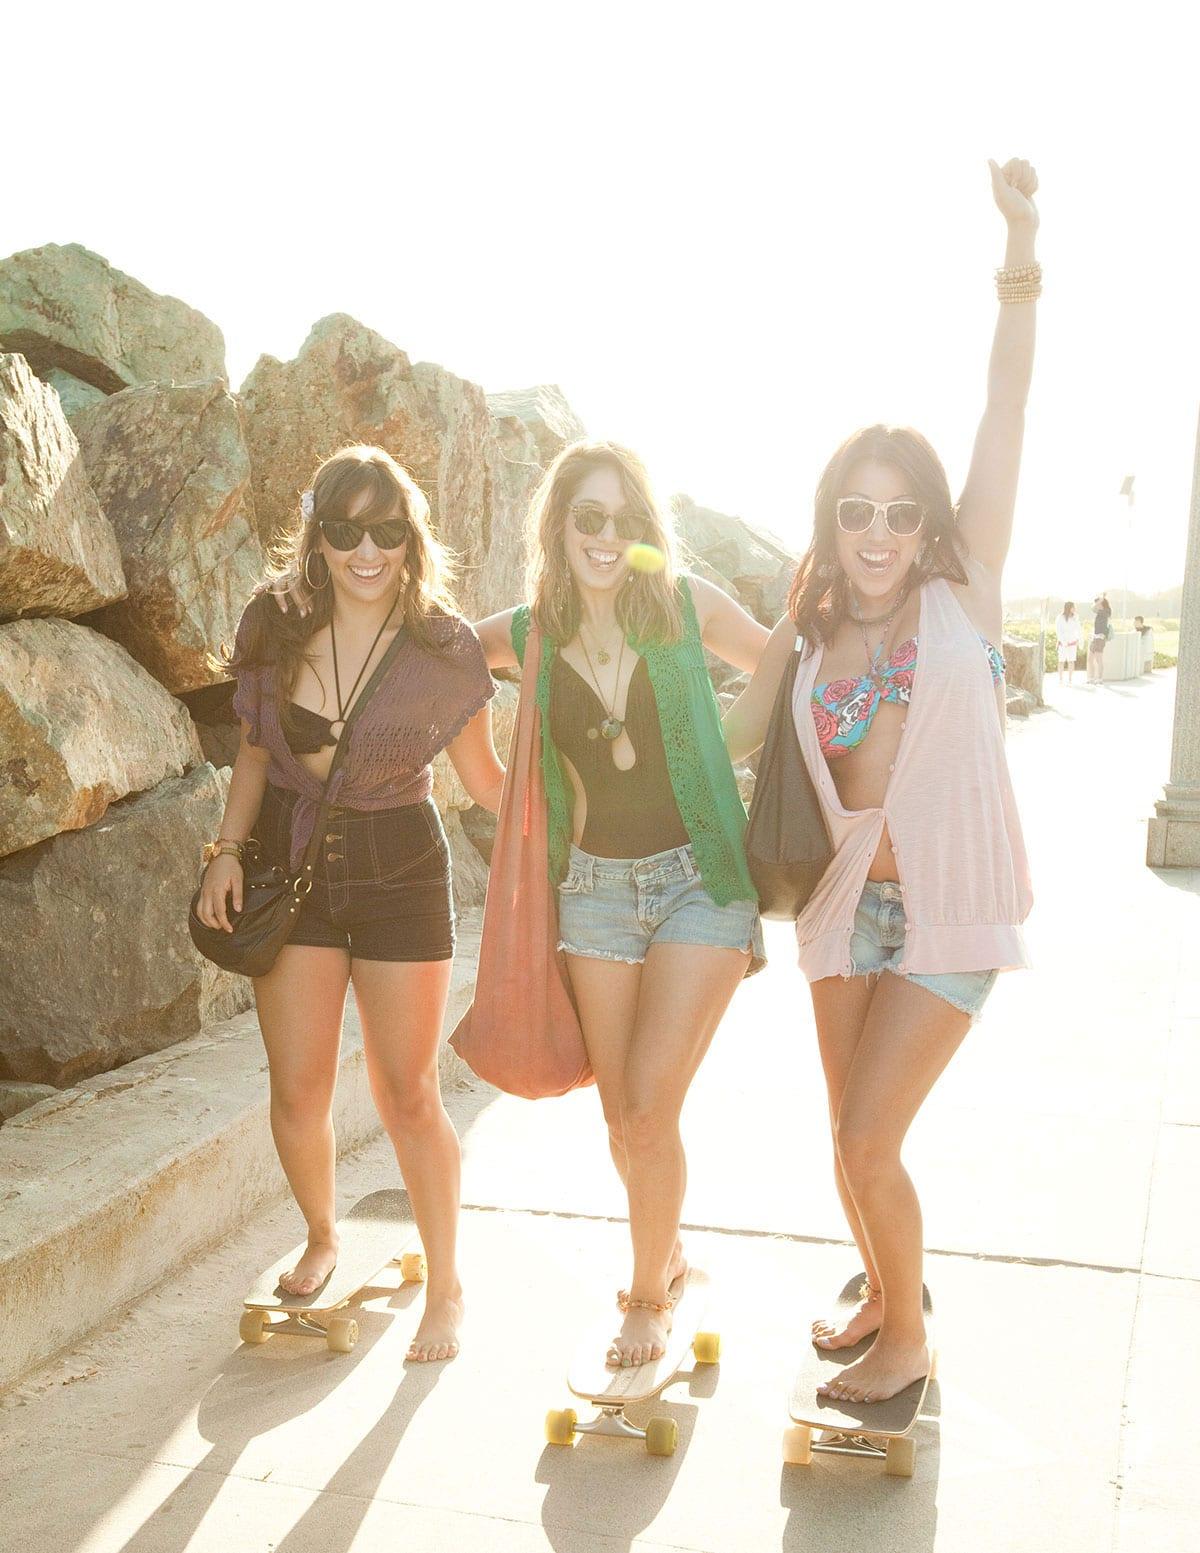 lIFESTYLE PHOTOGRAPHER goodbye-summer-beach-vibes-1001